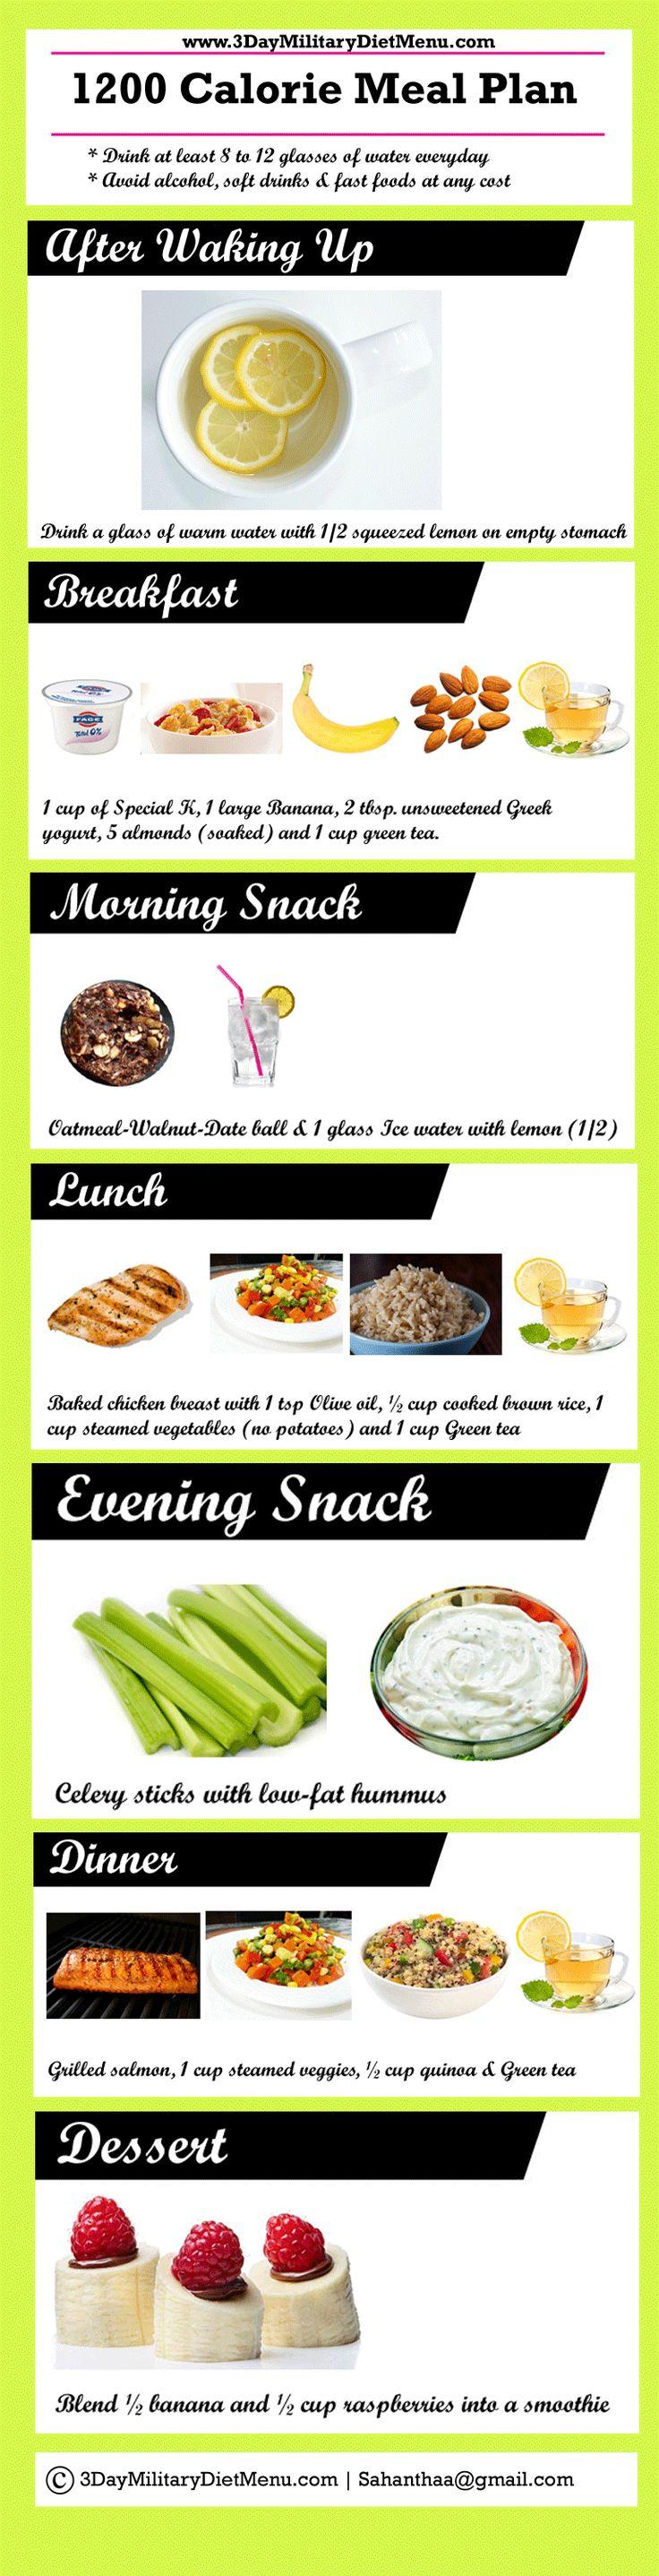 1200 calories diet weight loss